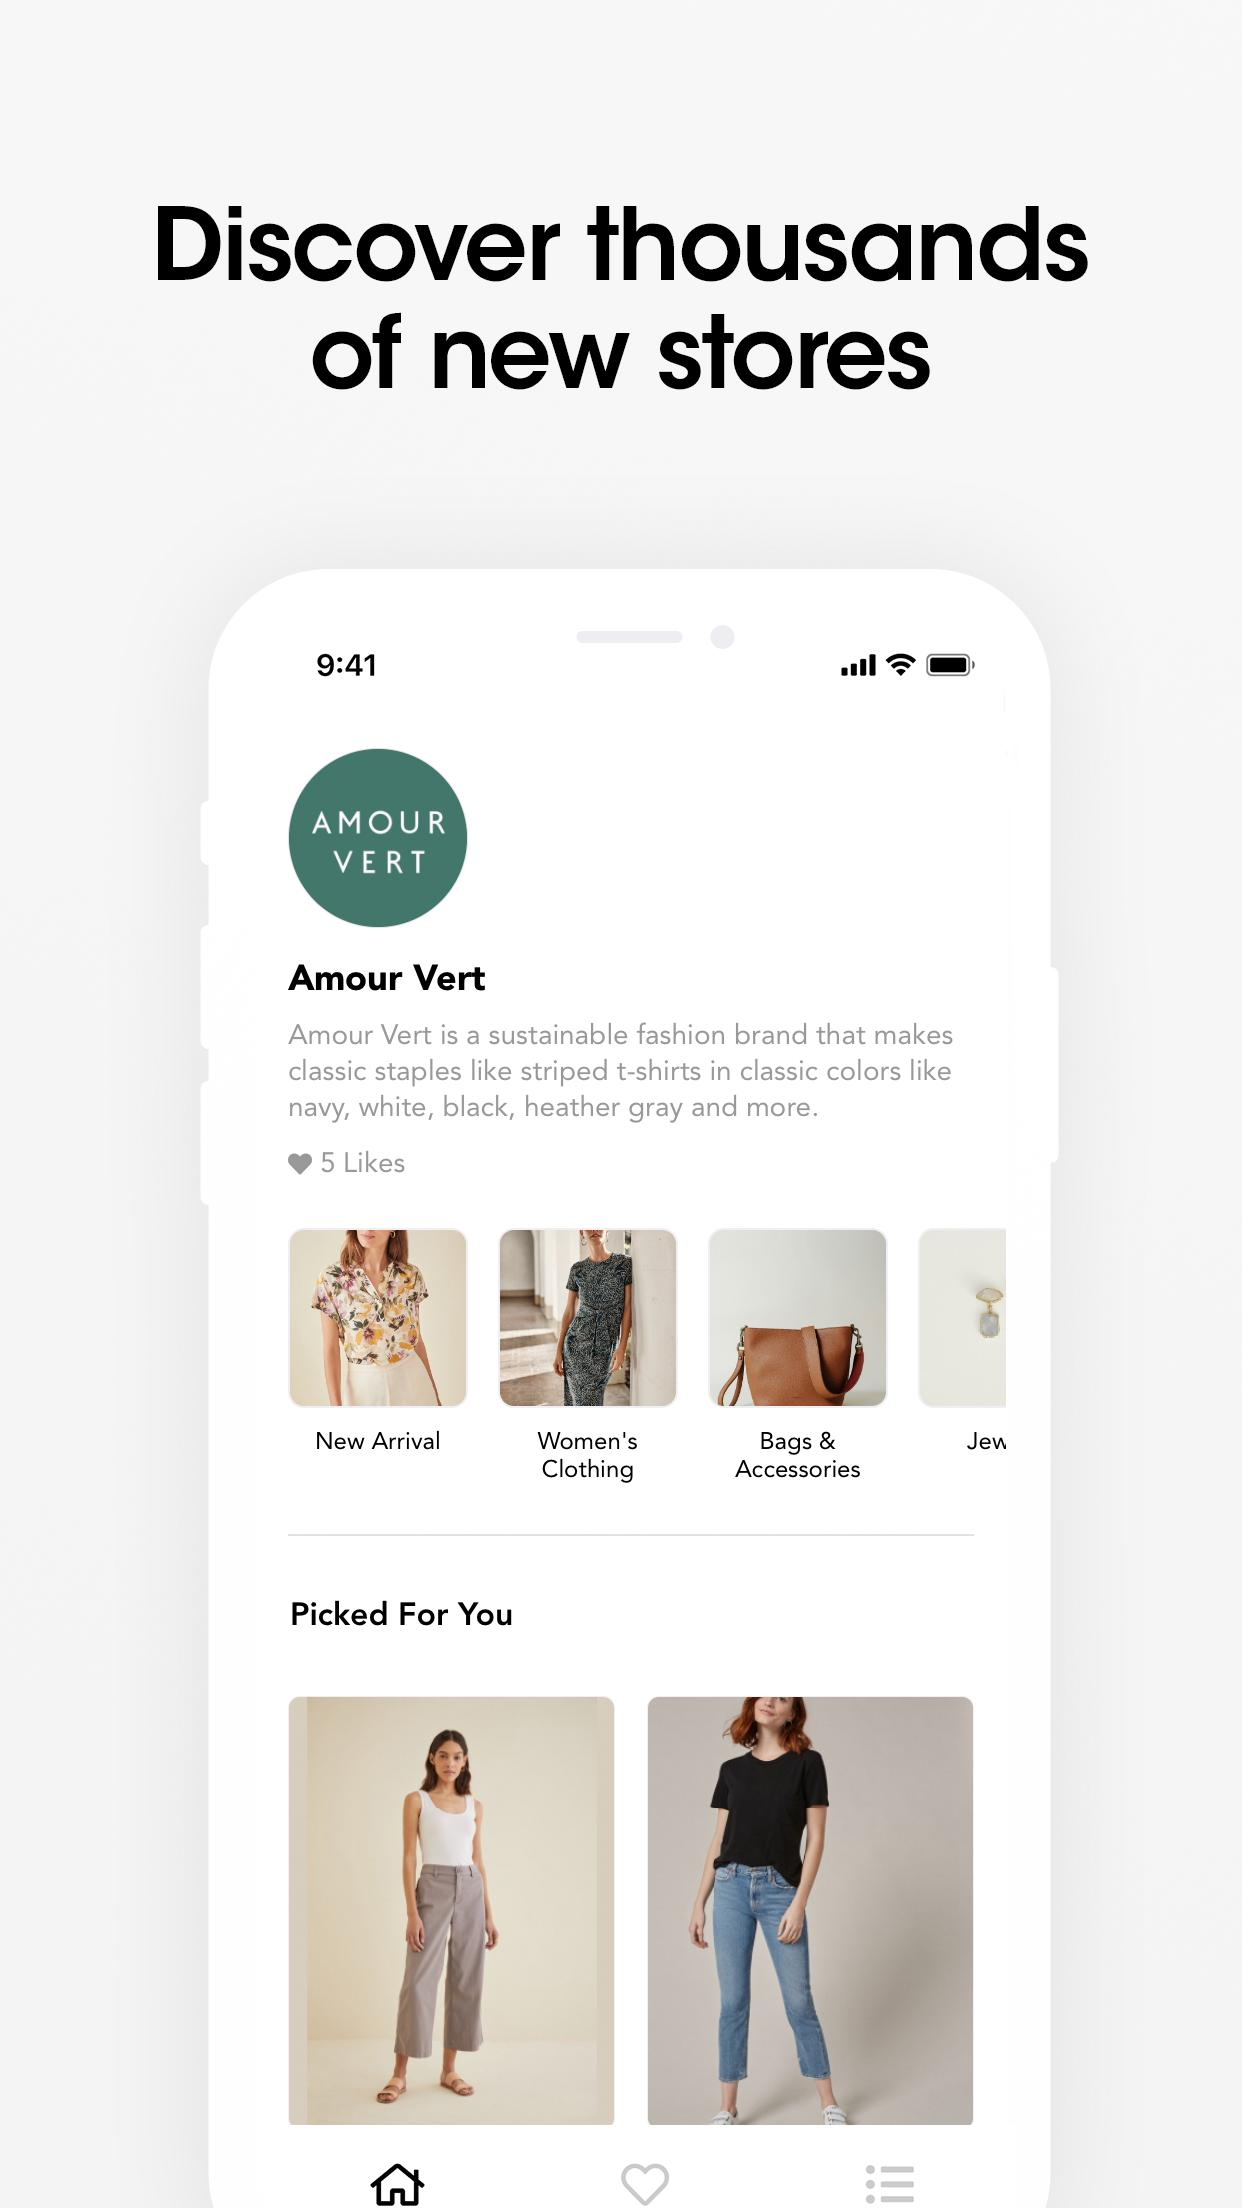 Autumn App - Fashion & Home Decor 1.16.0 Screenshot 6